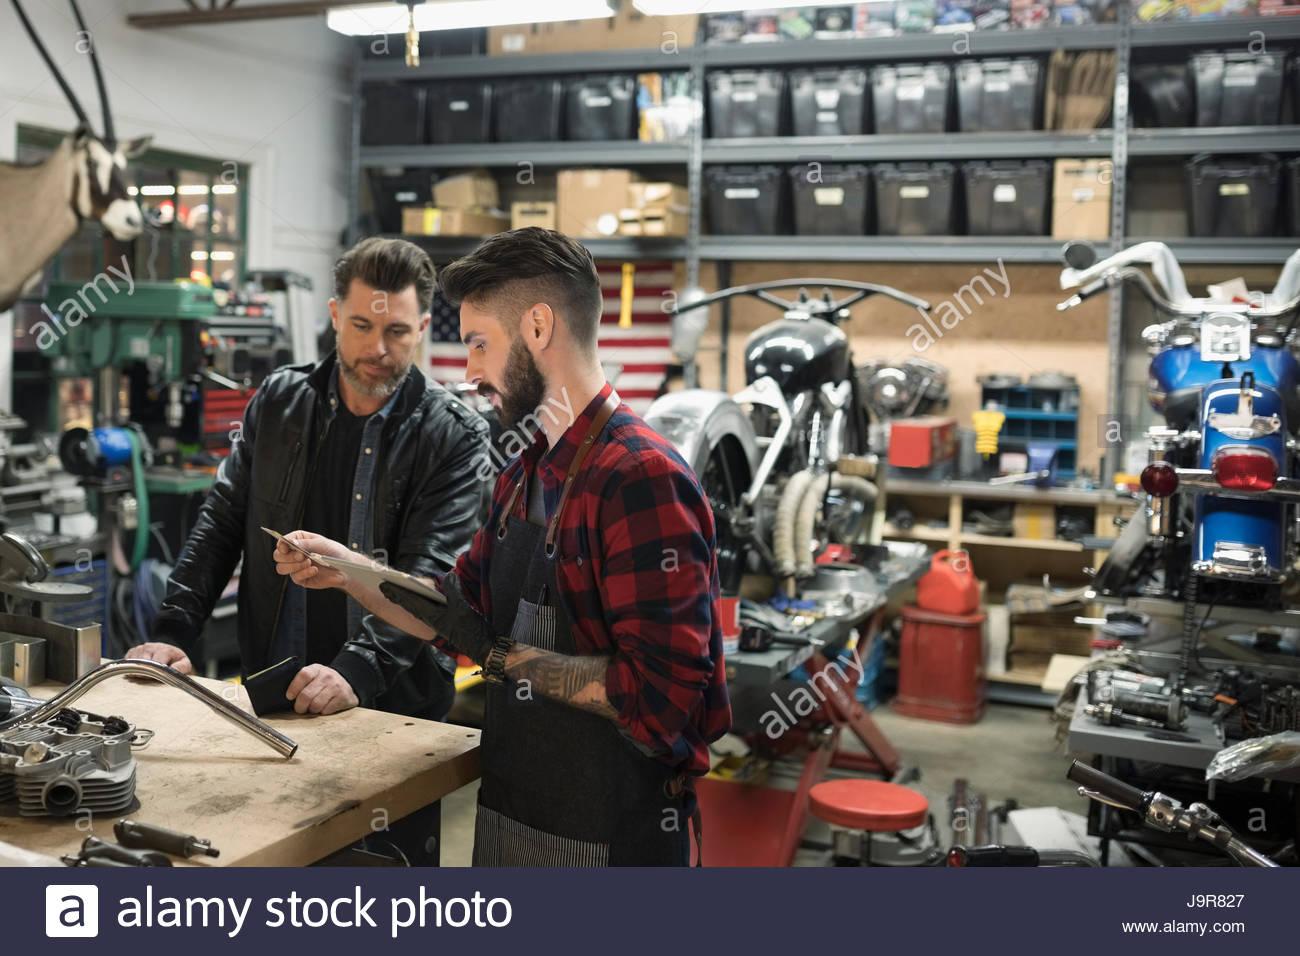 Motorcycle mechanics examining parts in auto repair shop - Stock Image